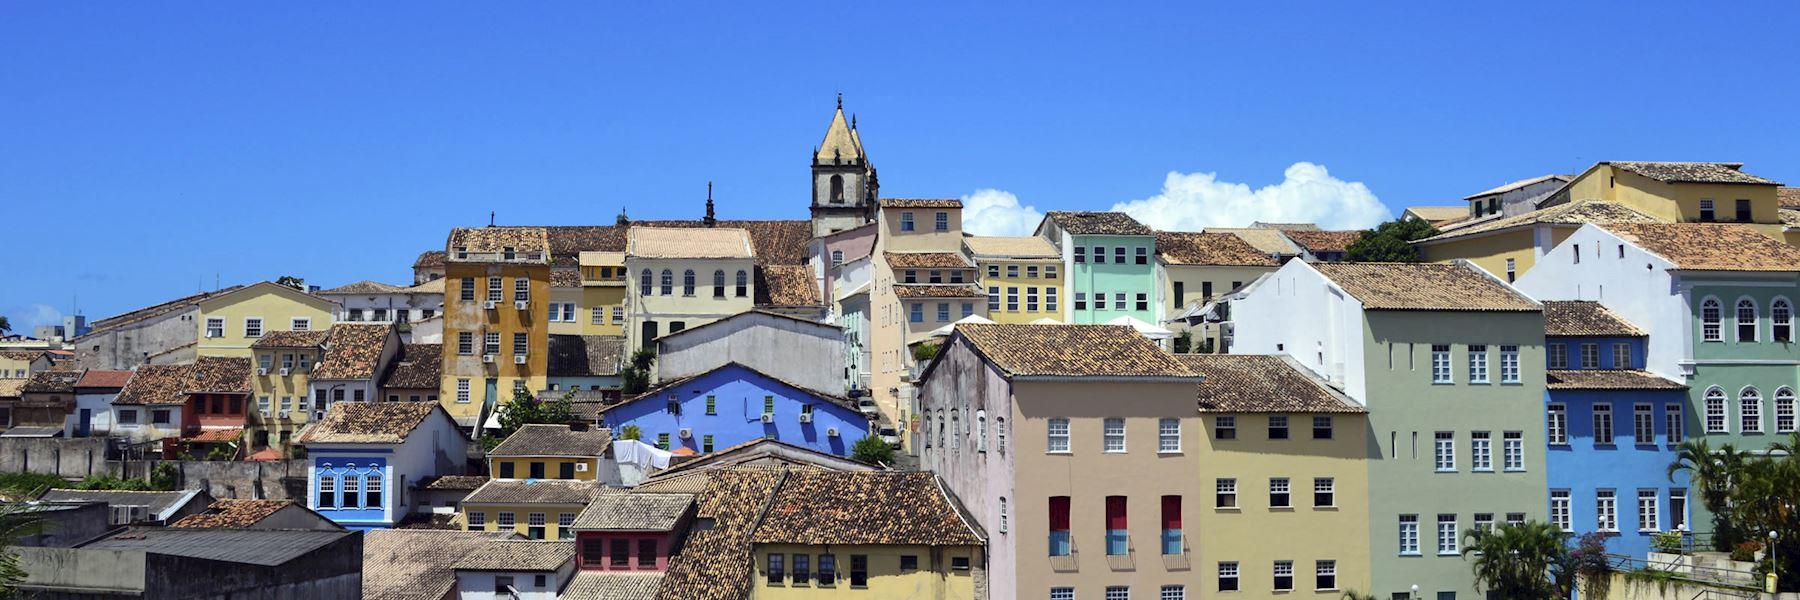 Visit Salvador, Brazil